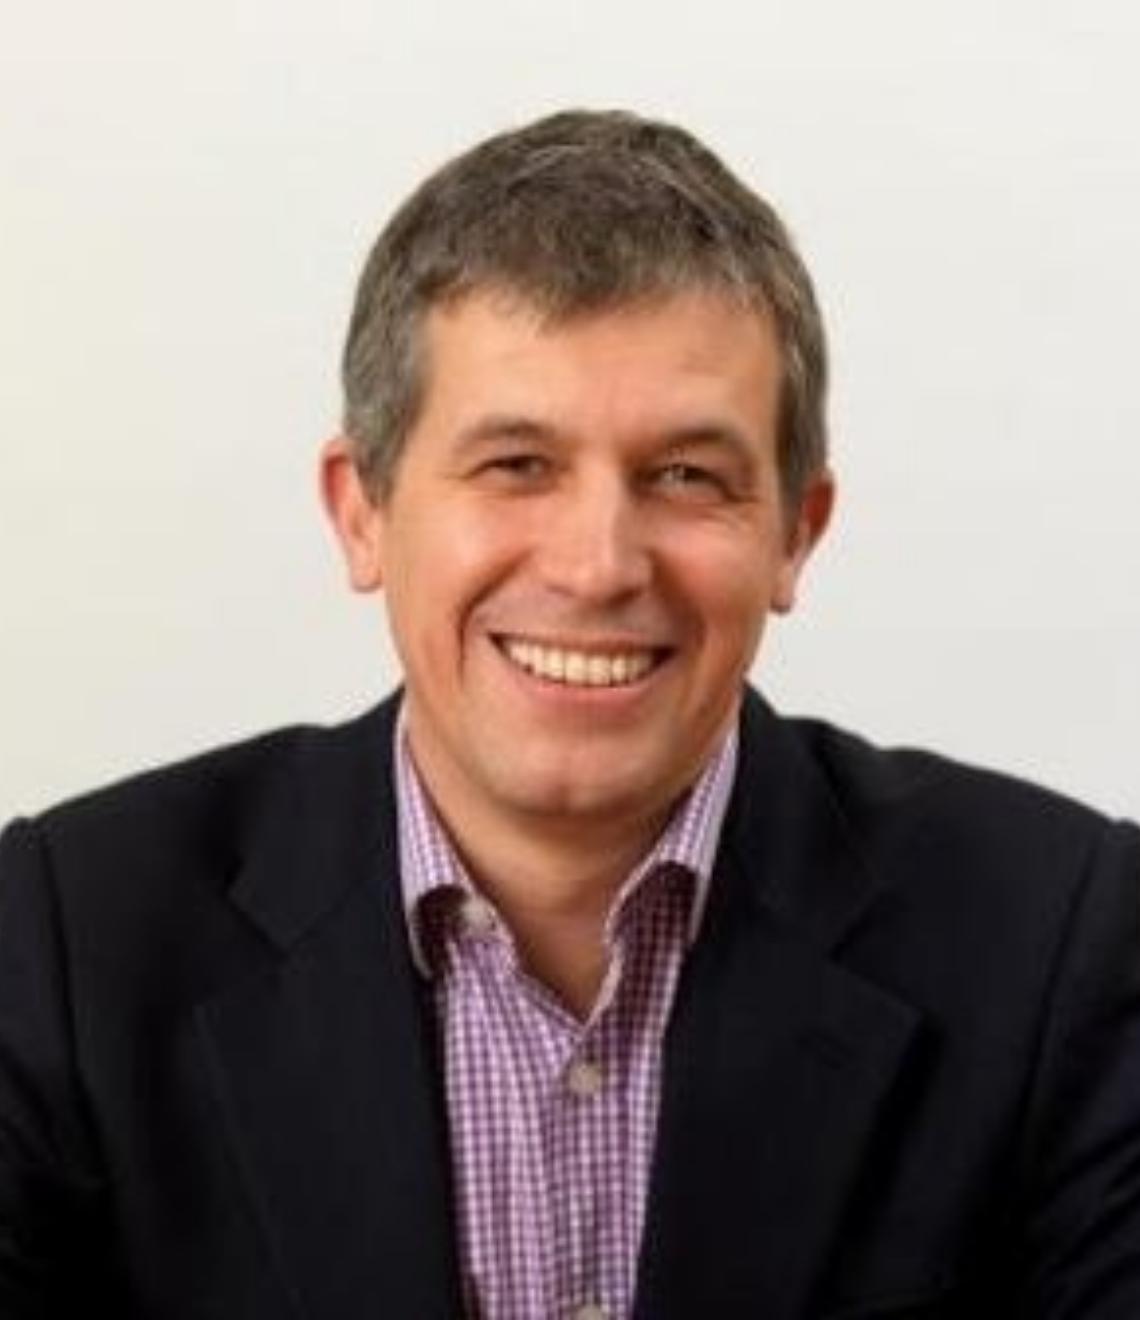 Andrew McLelland